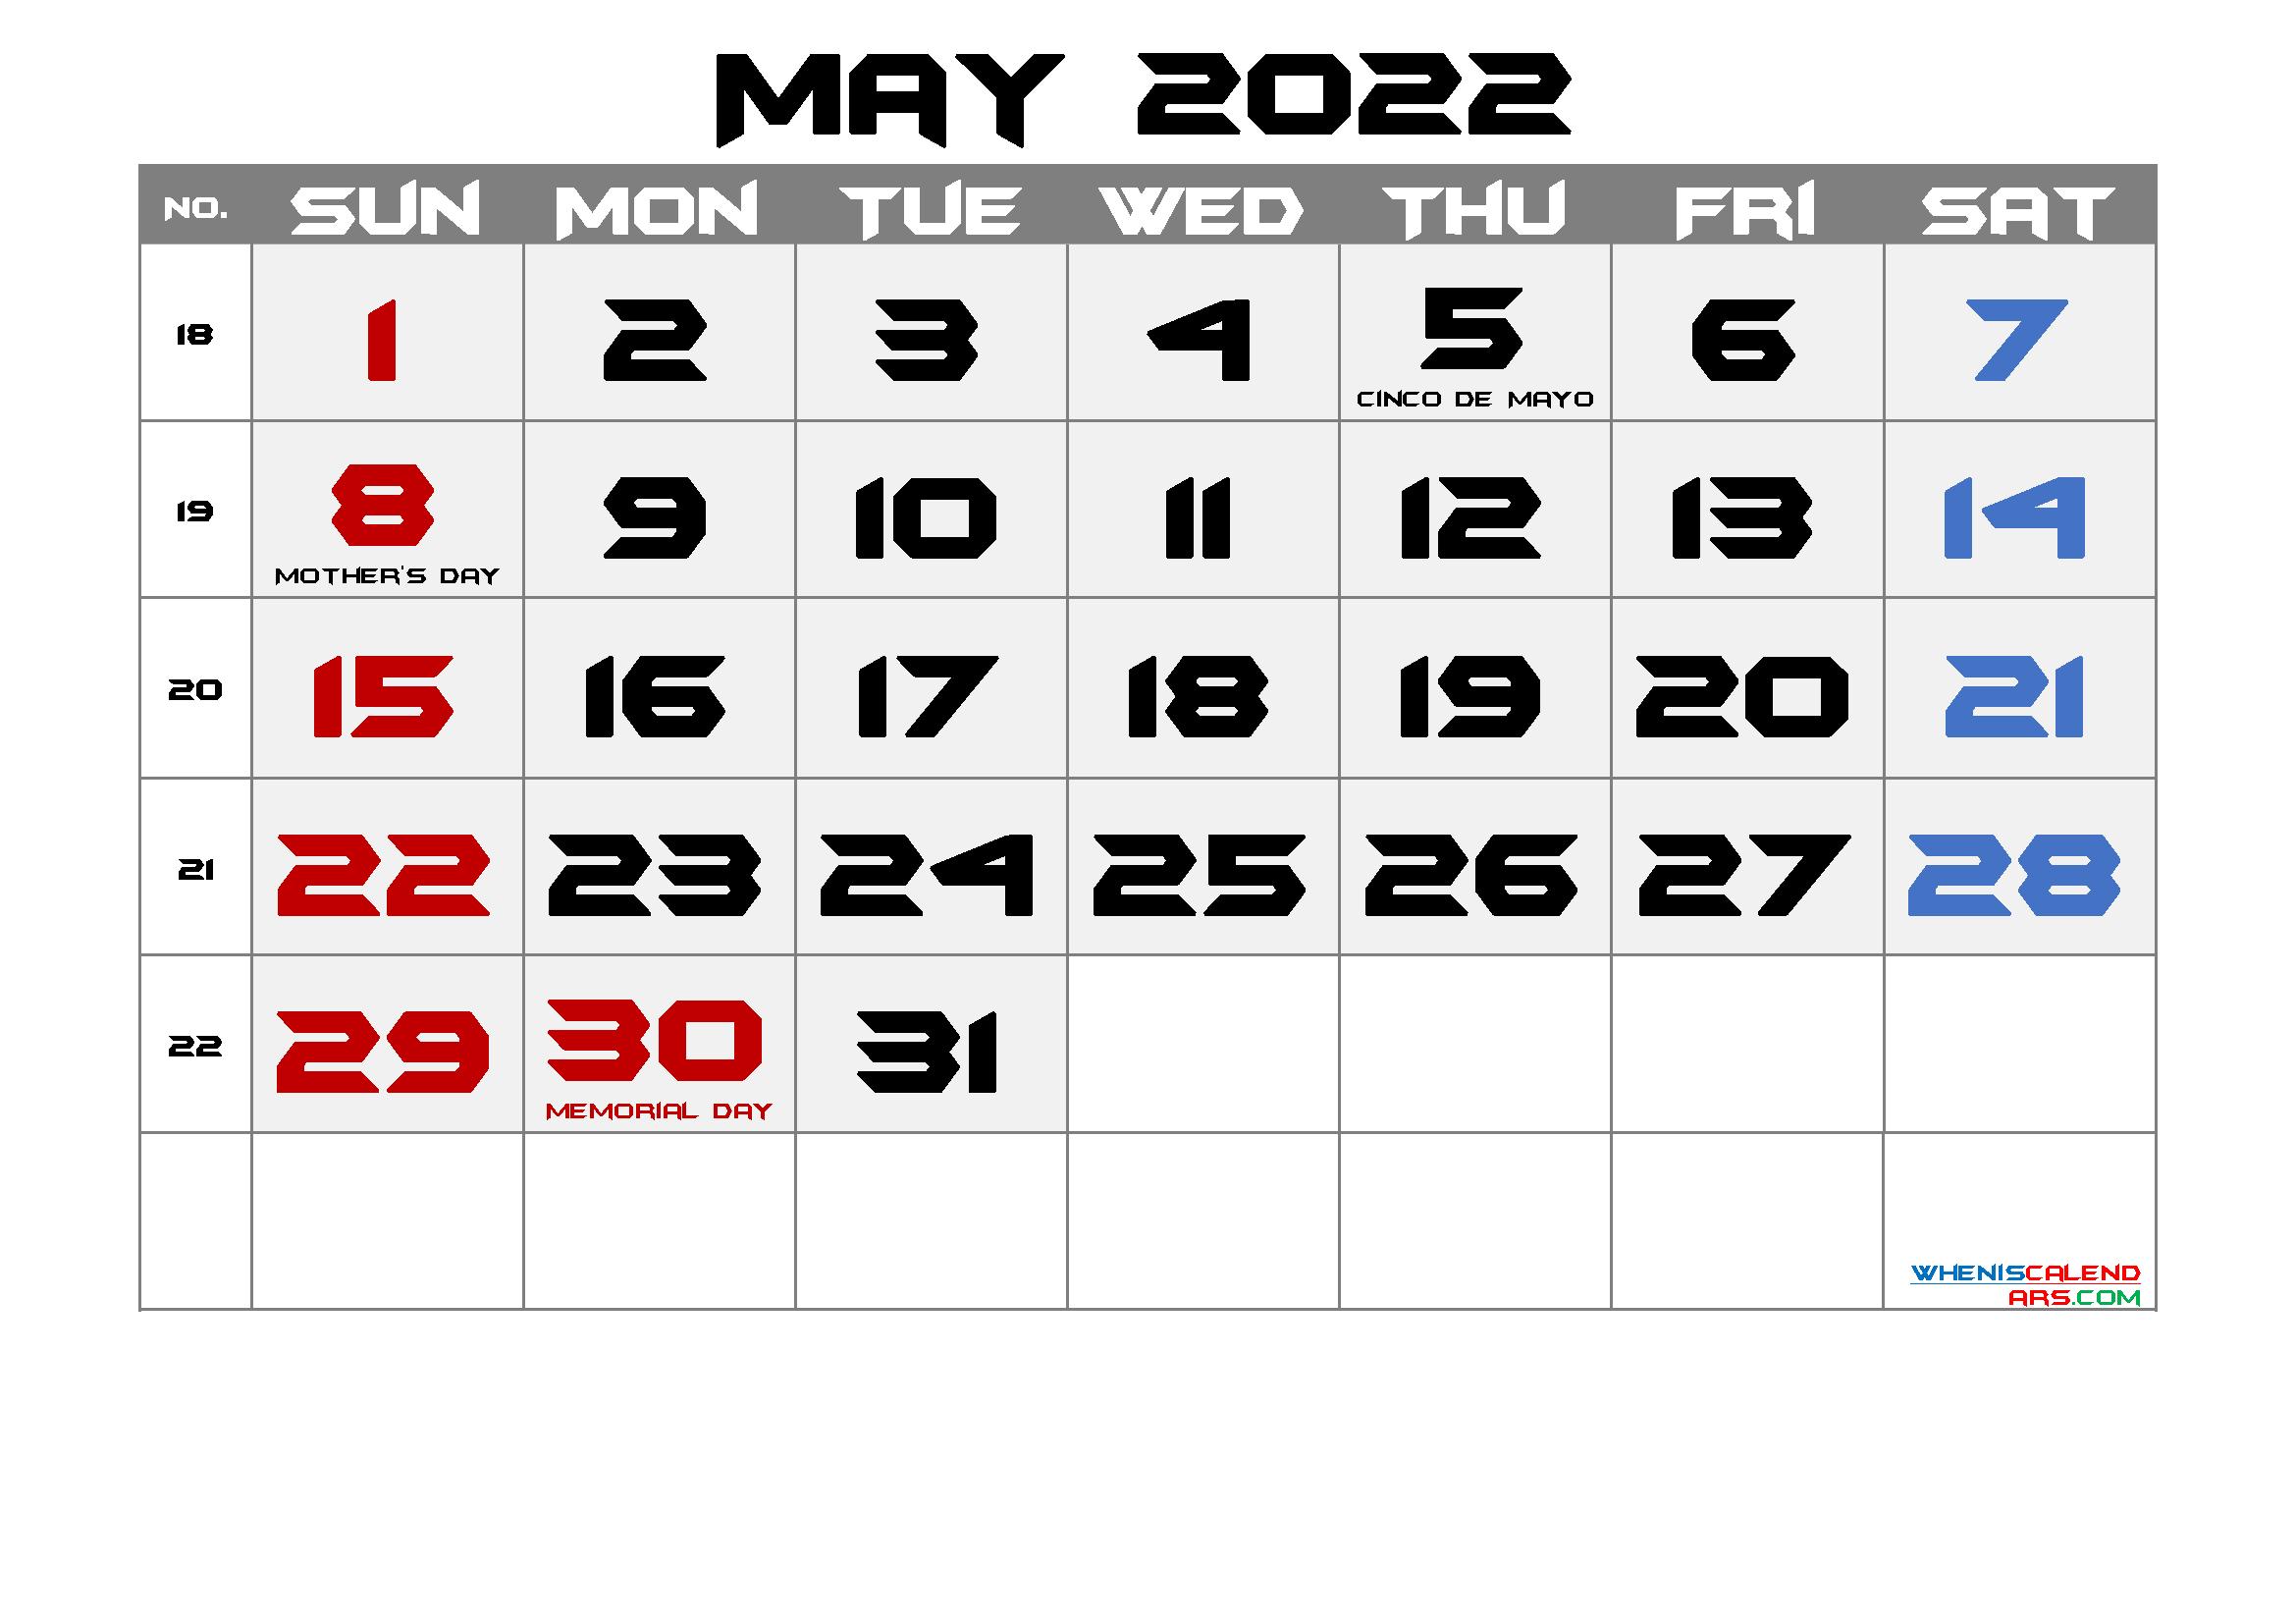 Free Printable May 2022 Calendar intended for May 2022 Calendar Printable